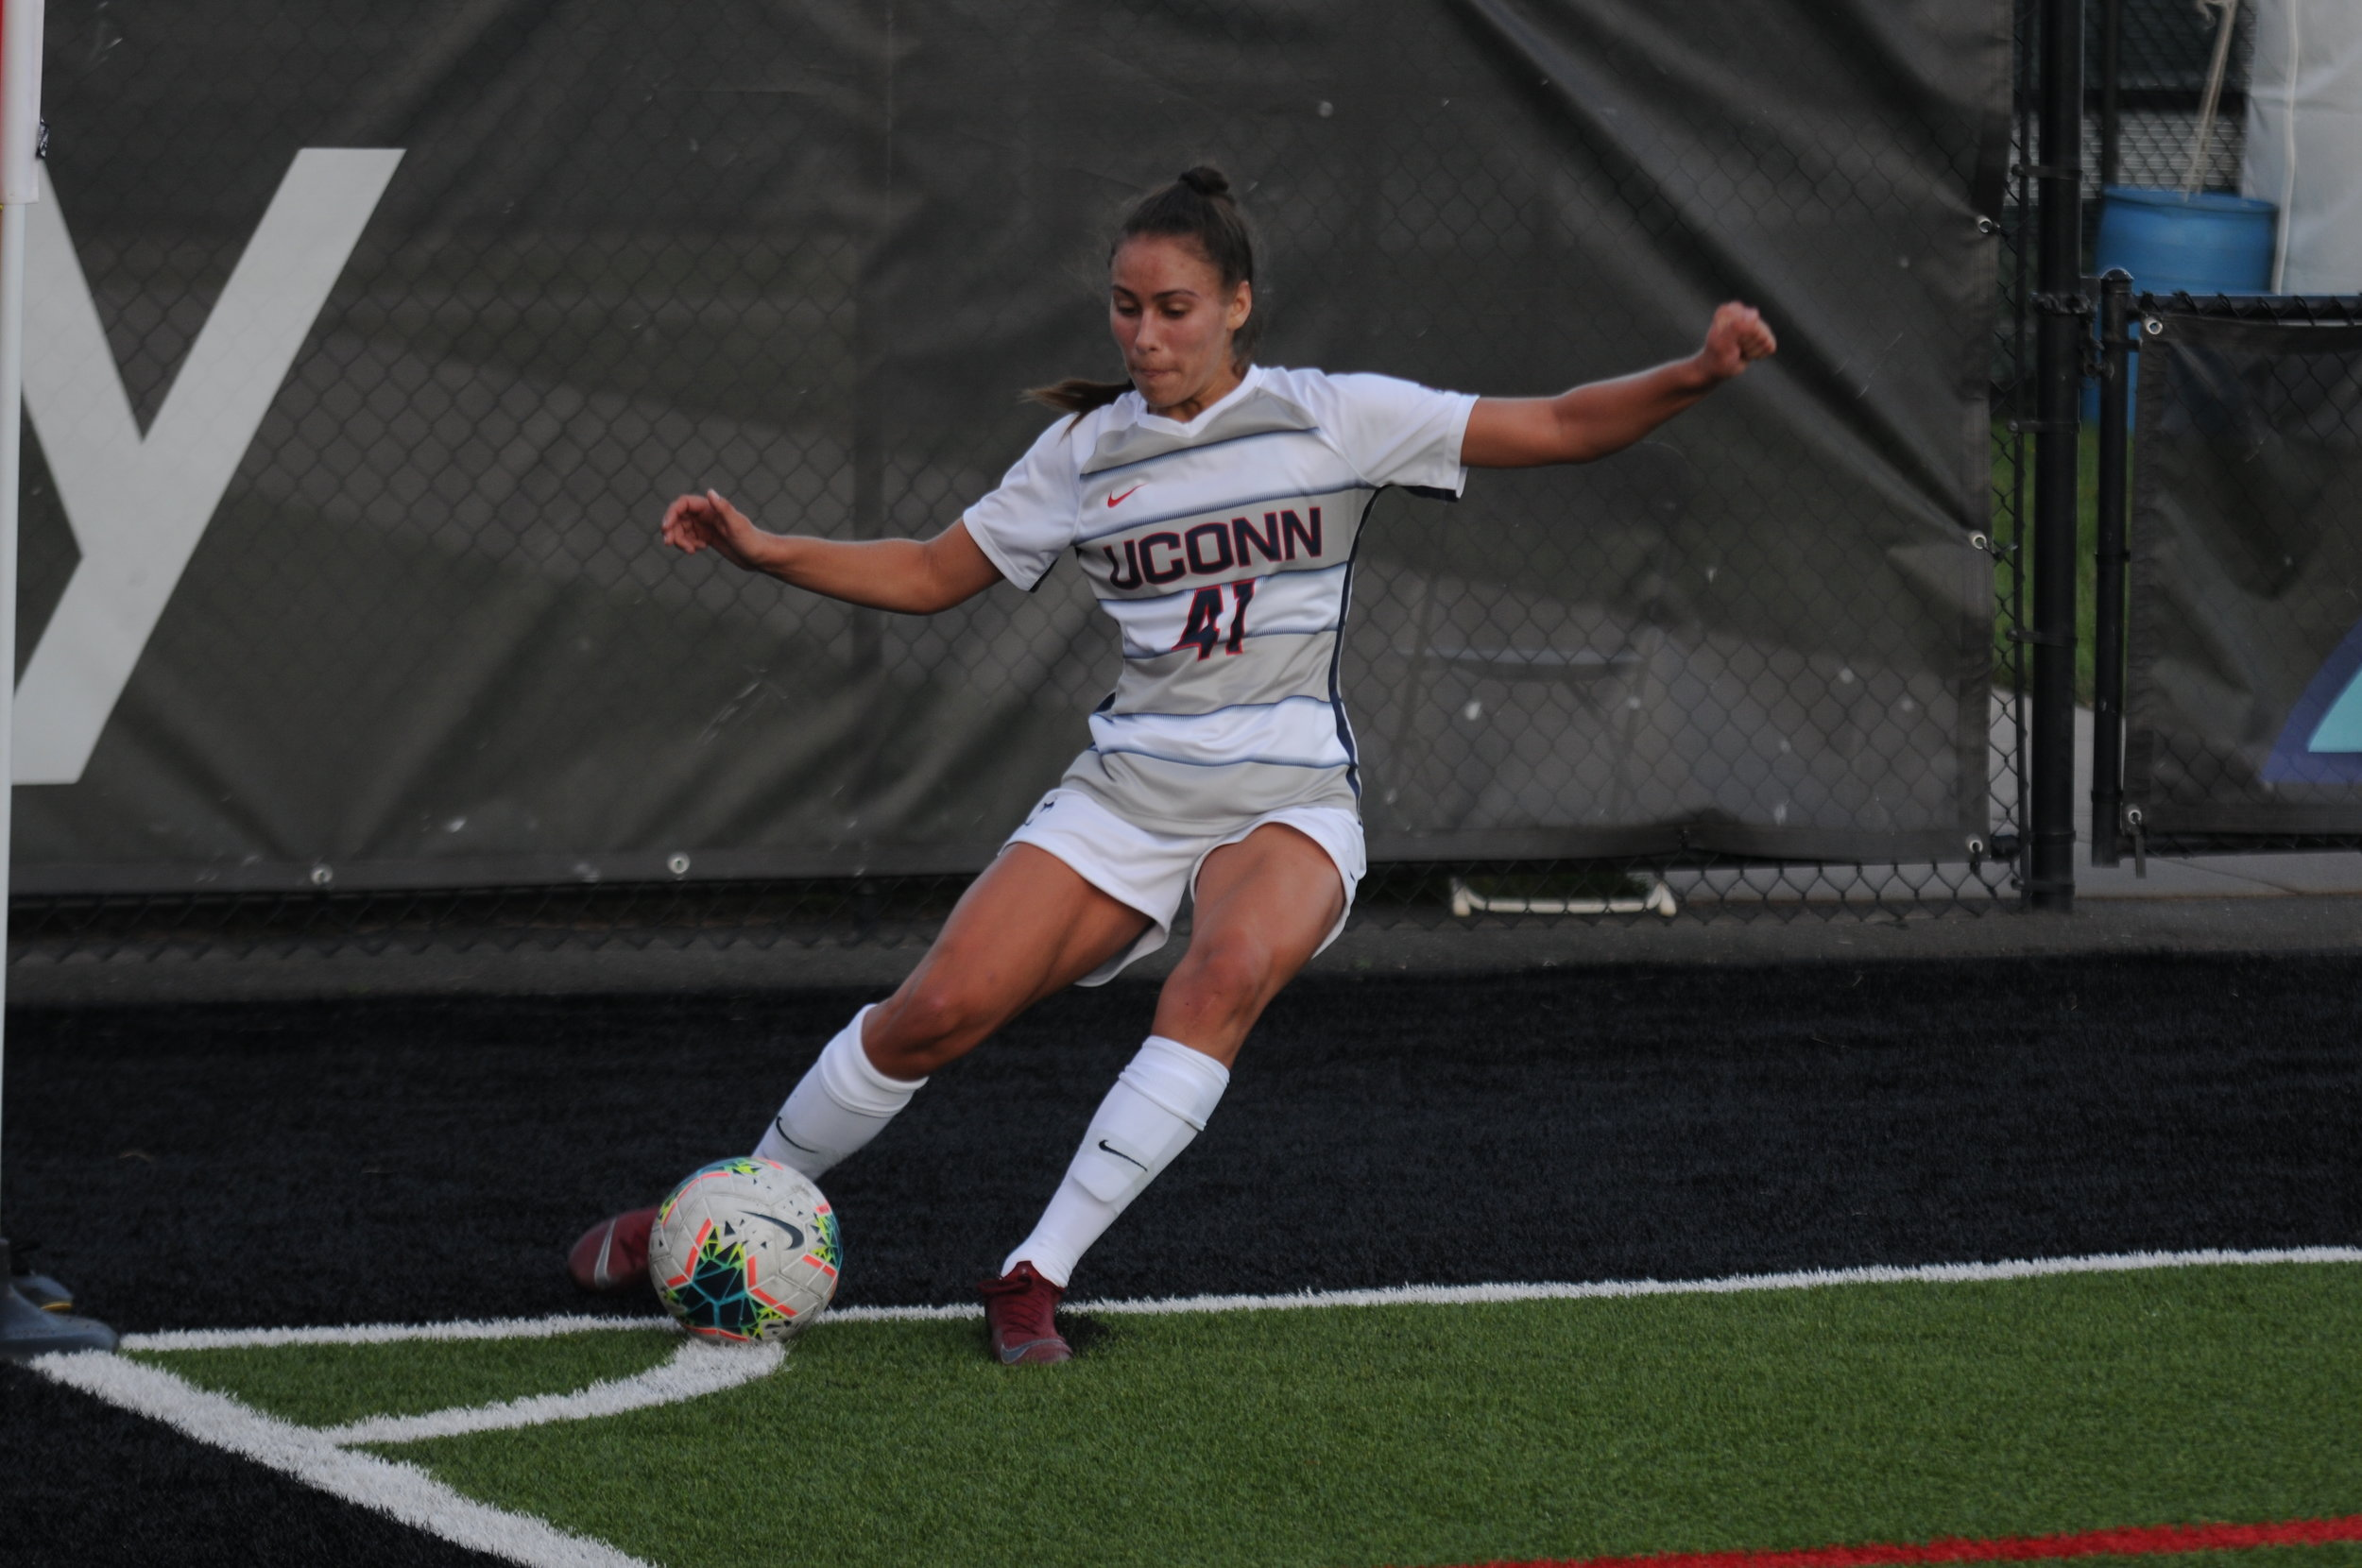 The UConn Women's Soccer team won 3-1 against Boston University.  Photo by Matt Pickett, Staff Photographer / The Daily Campus